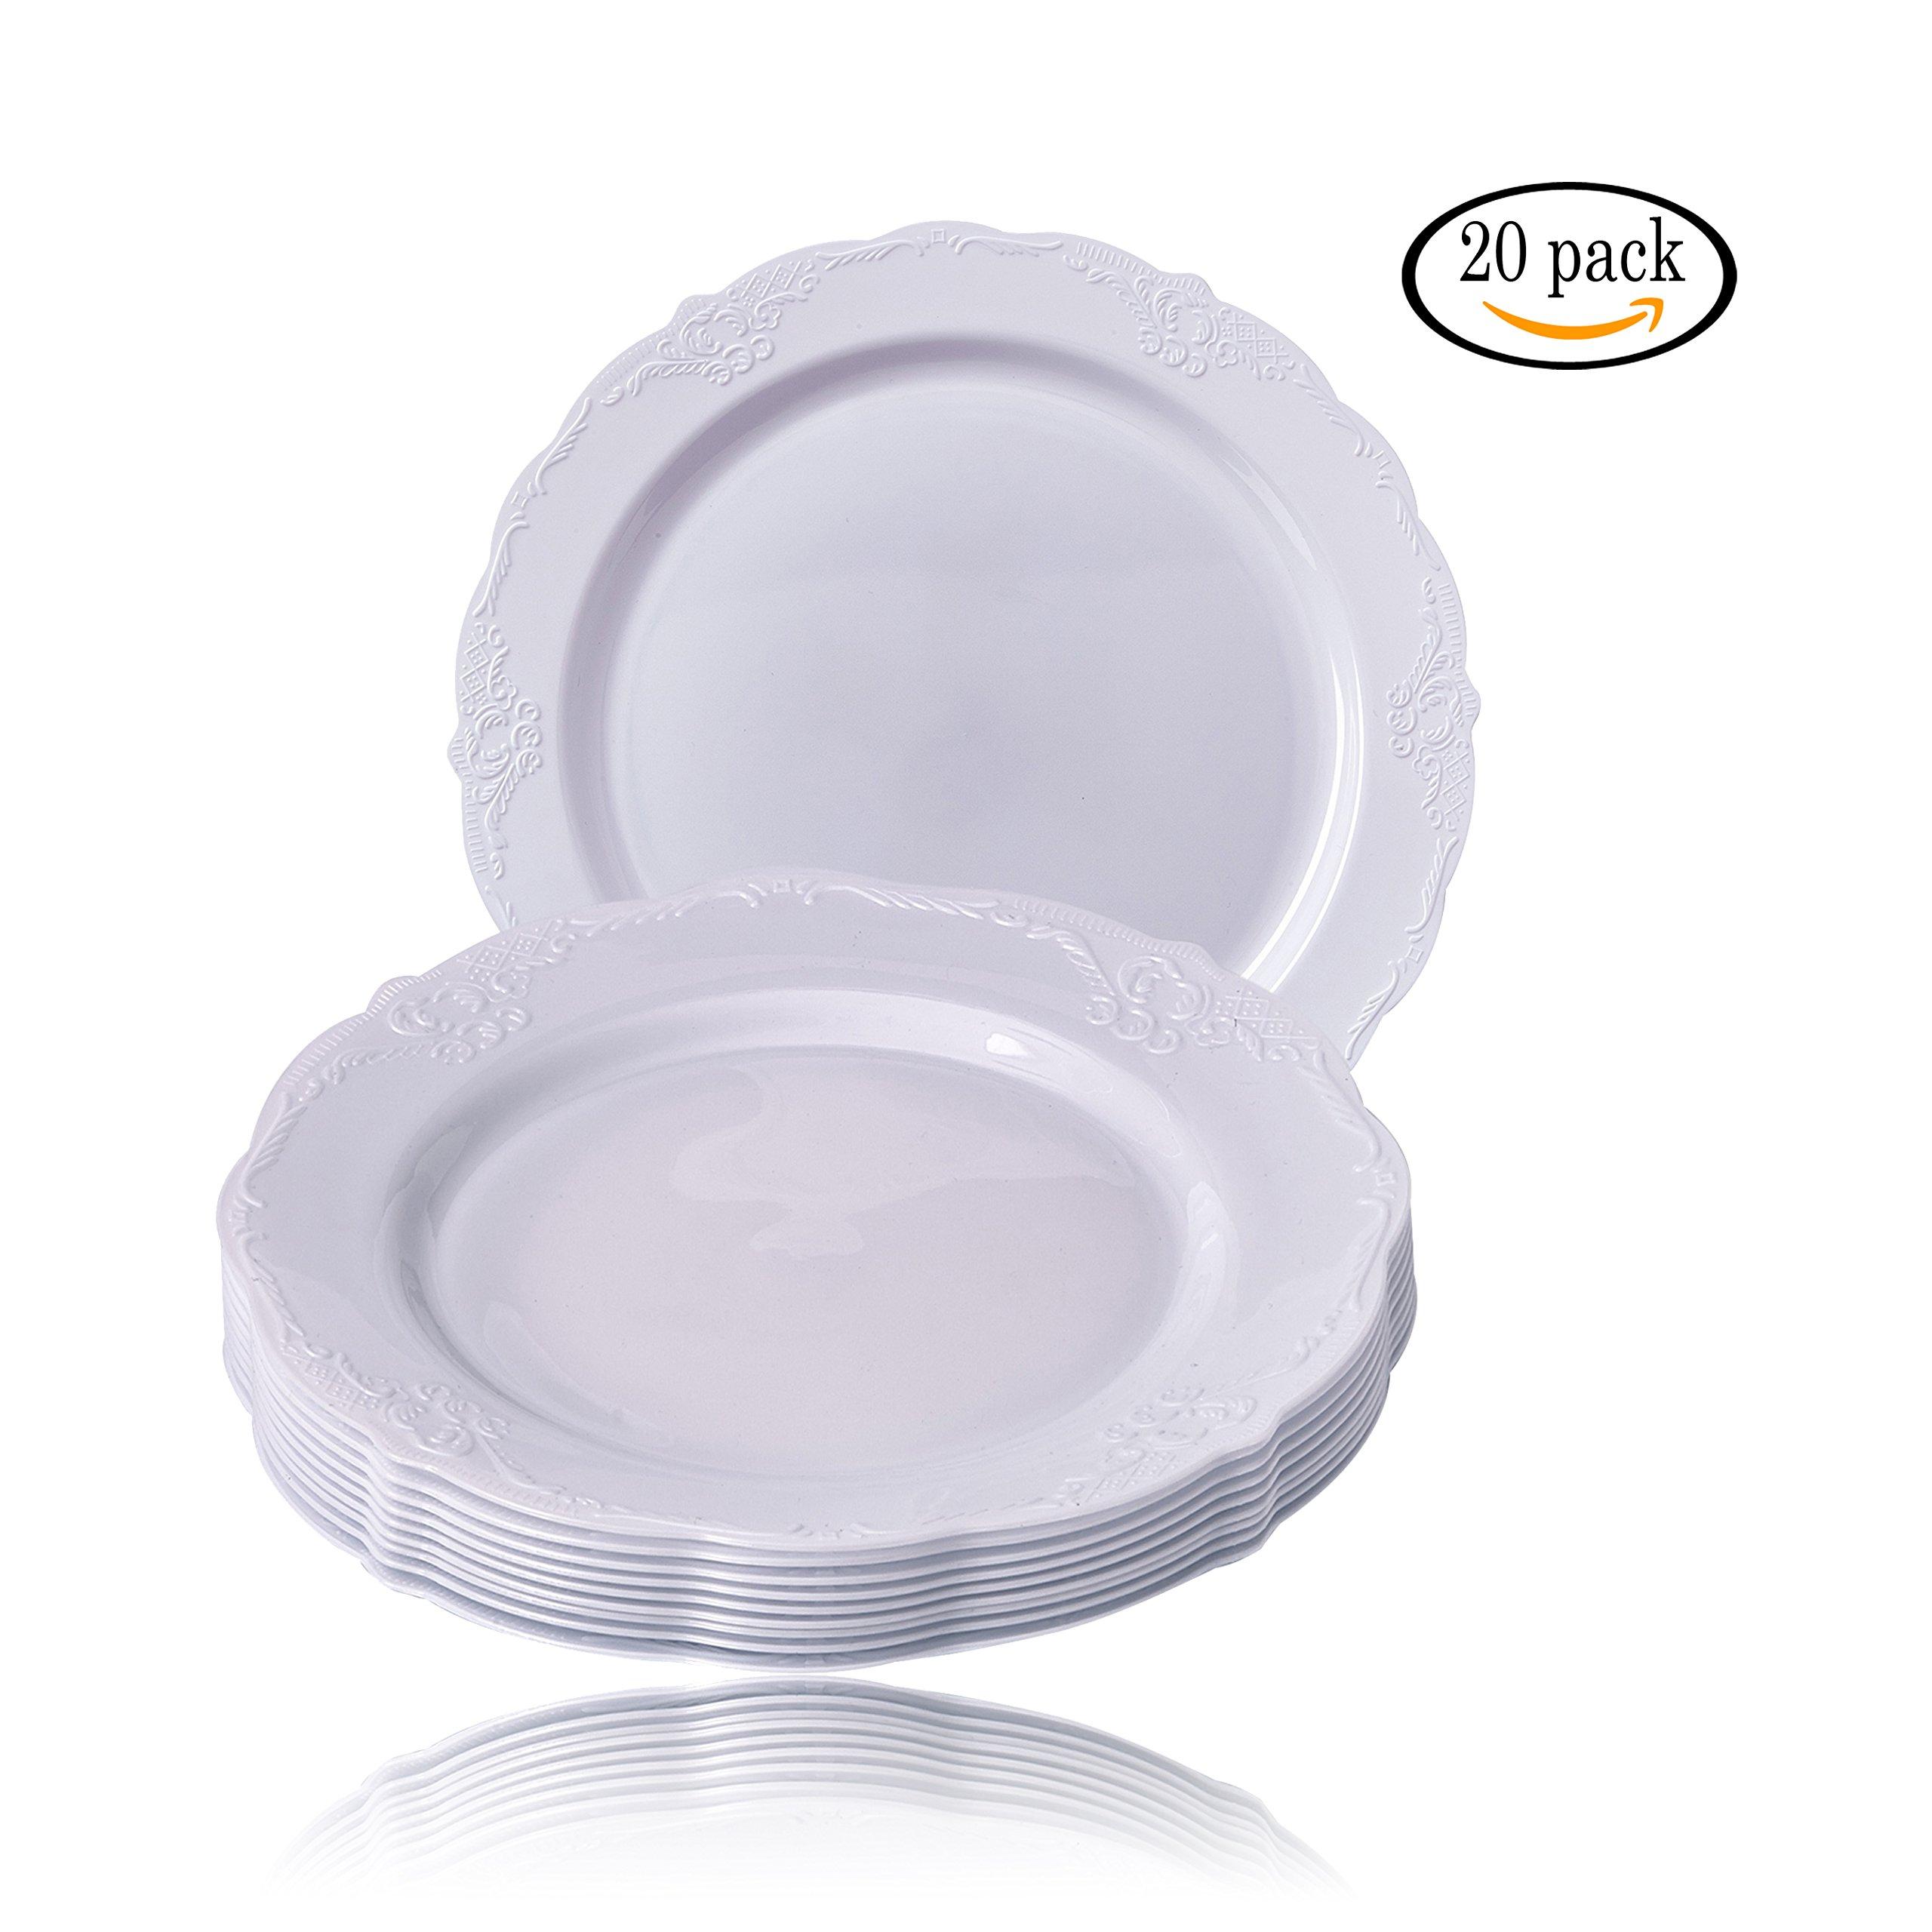 20 Premium Reusable Plastic Salad Plates | Vintage